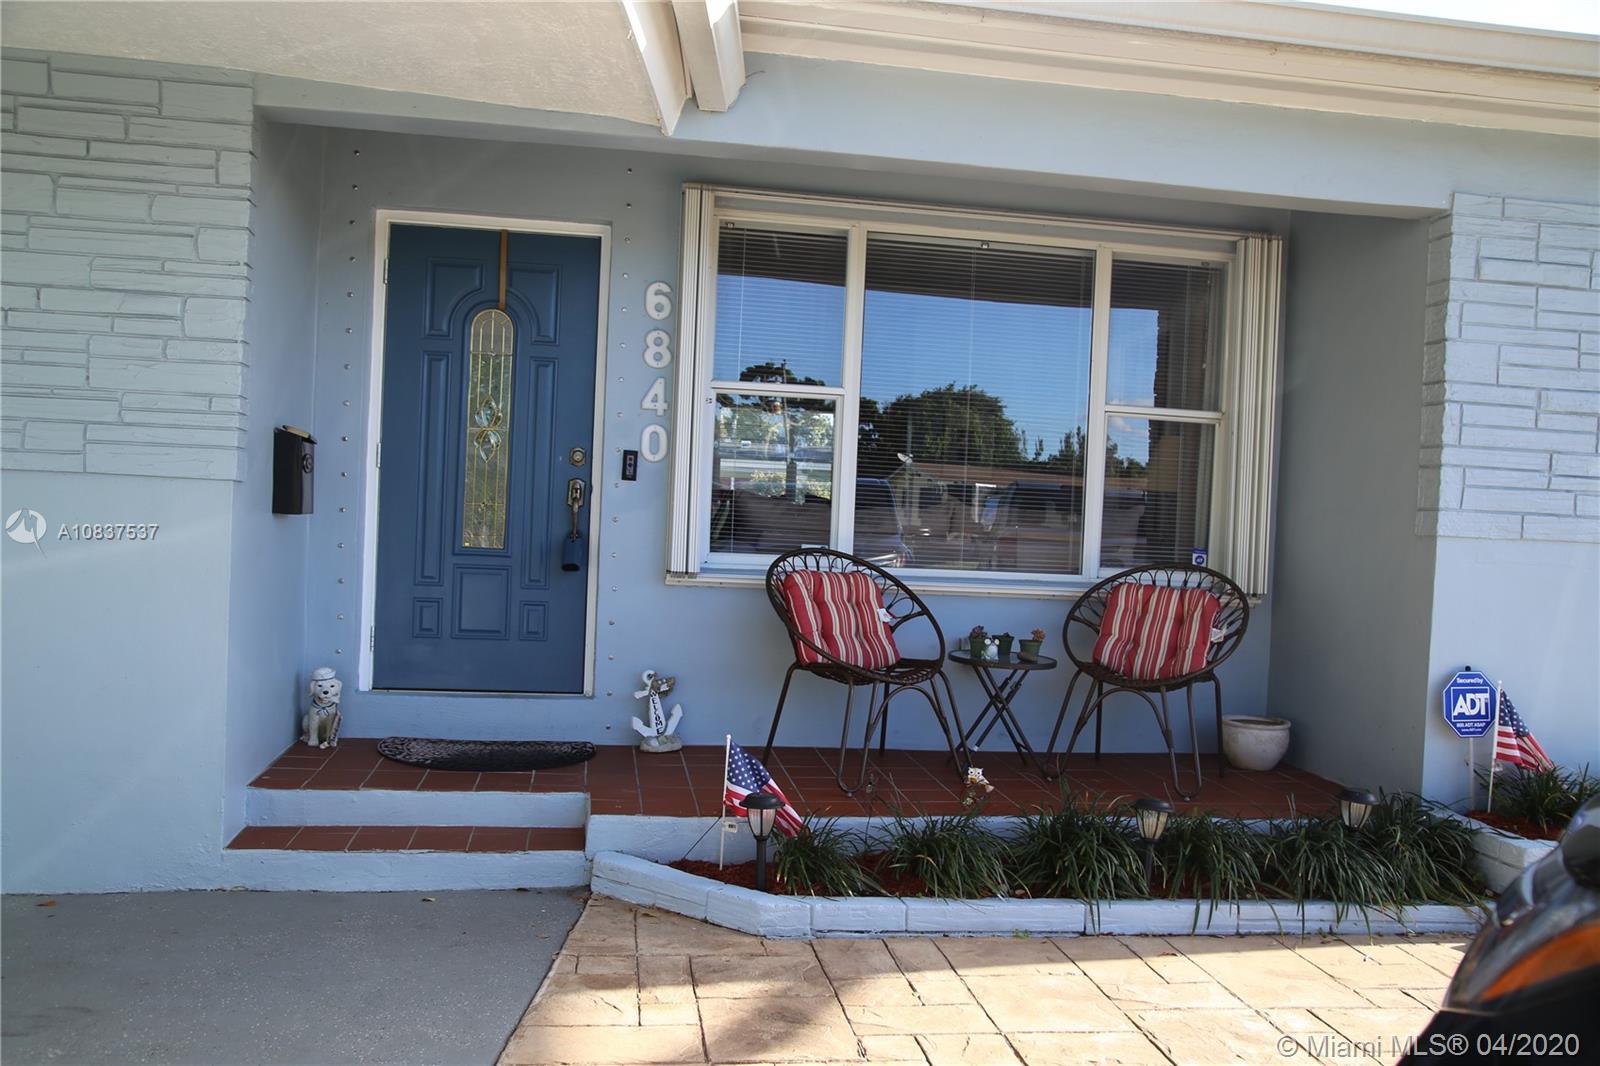 6840 SW 10th St, Pembroke Pines, FL 33023 - Pembroke Pines, FL real estate listing